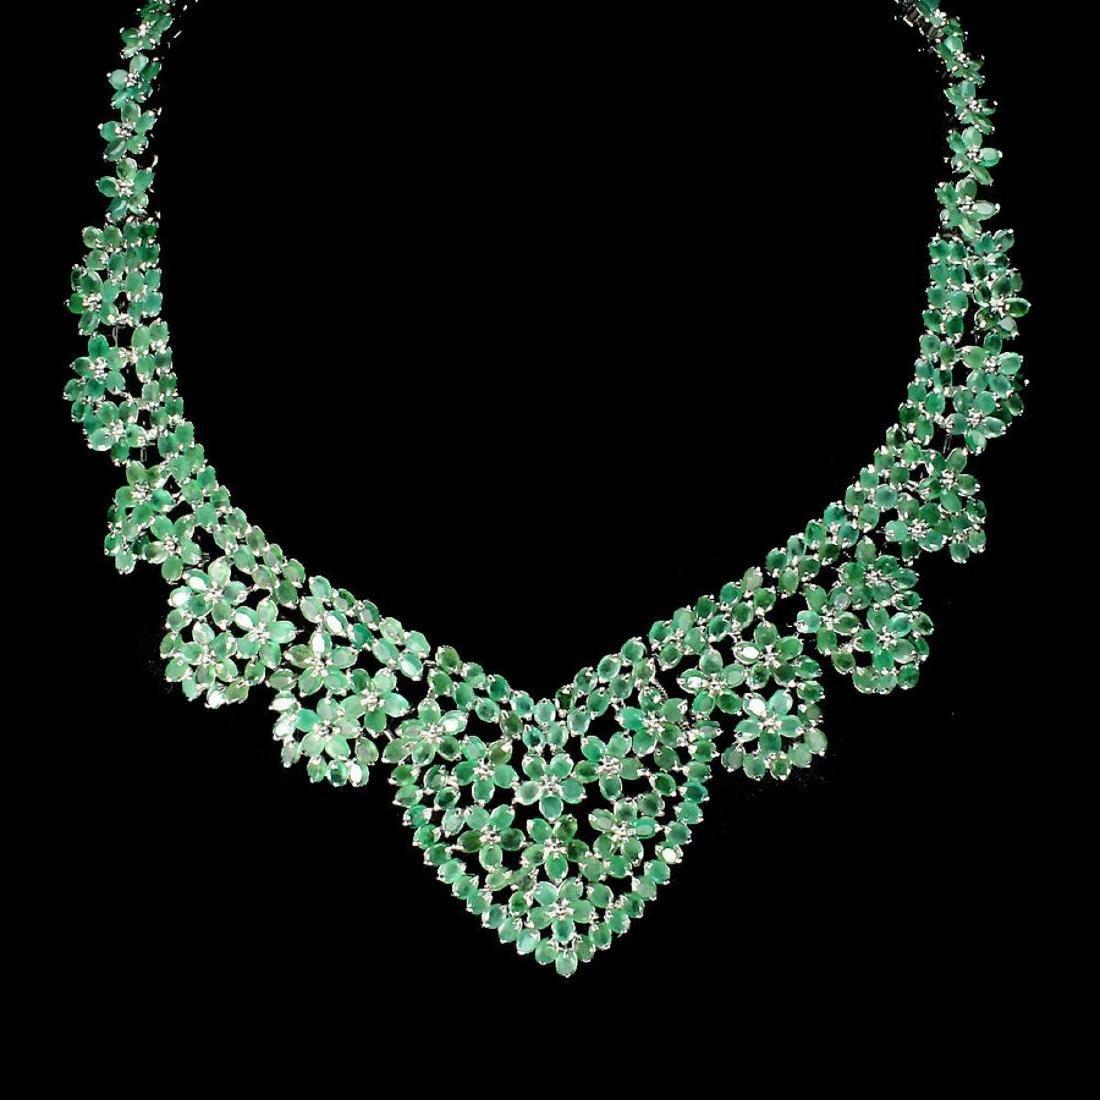 Natural Columbian Emerald 467 Ct Necklace